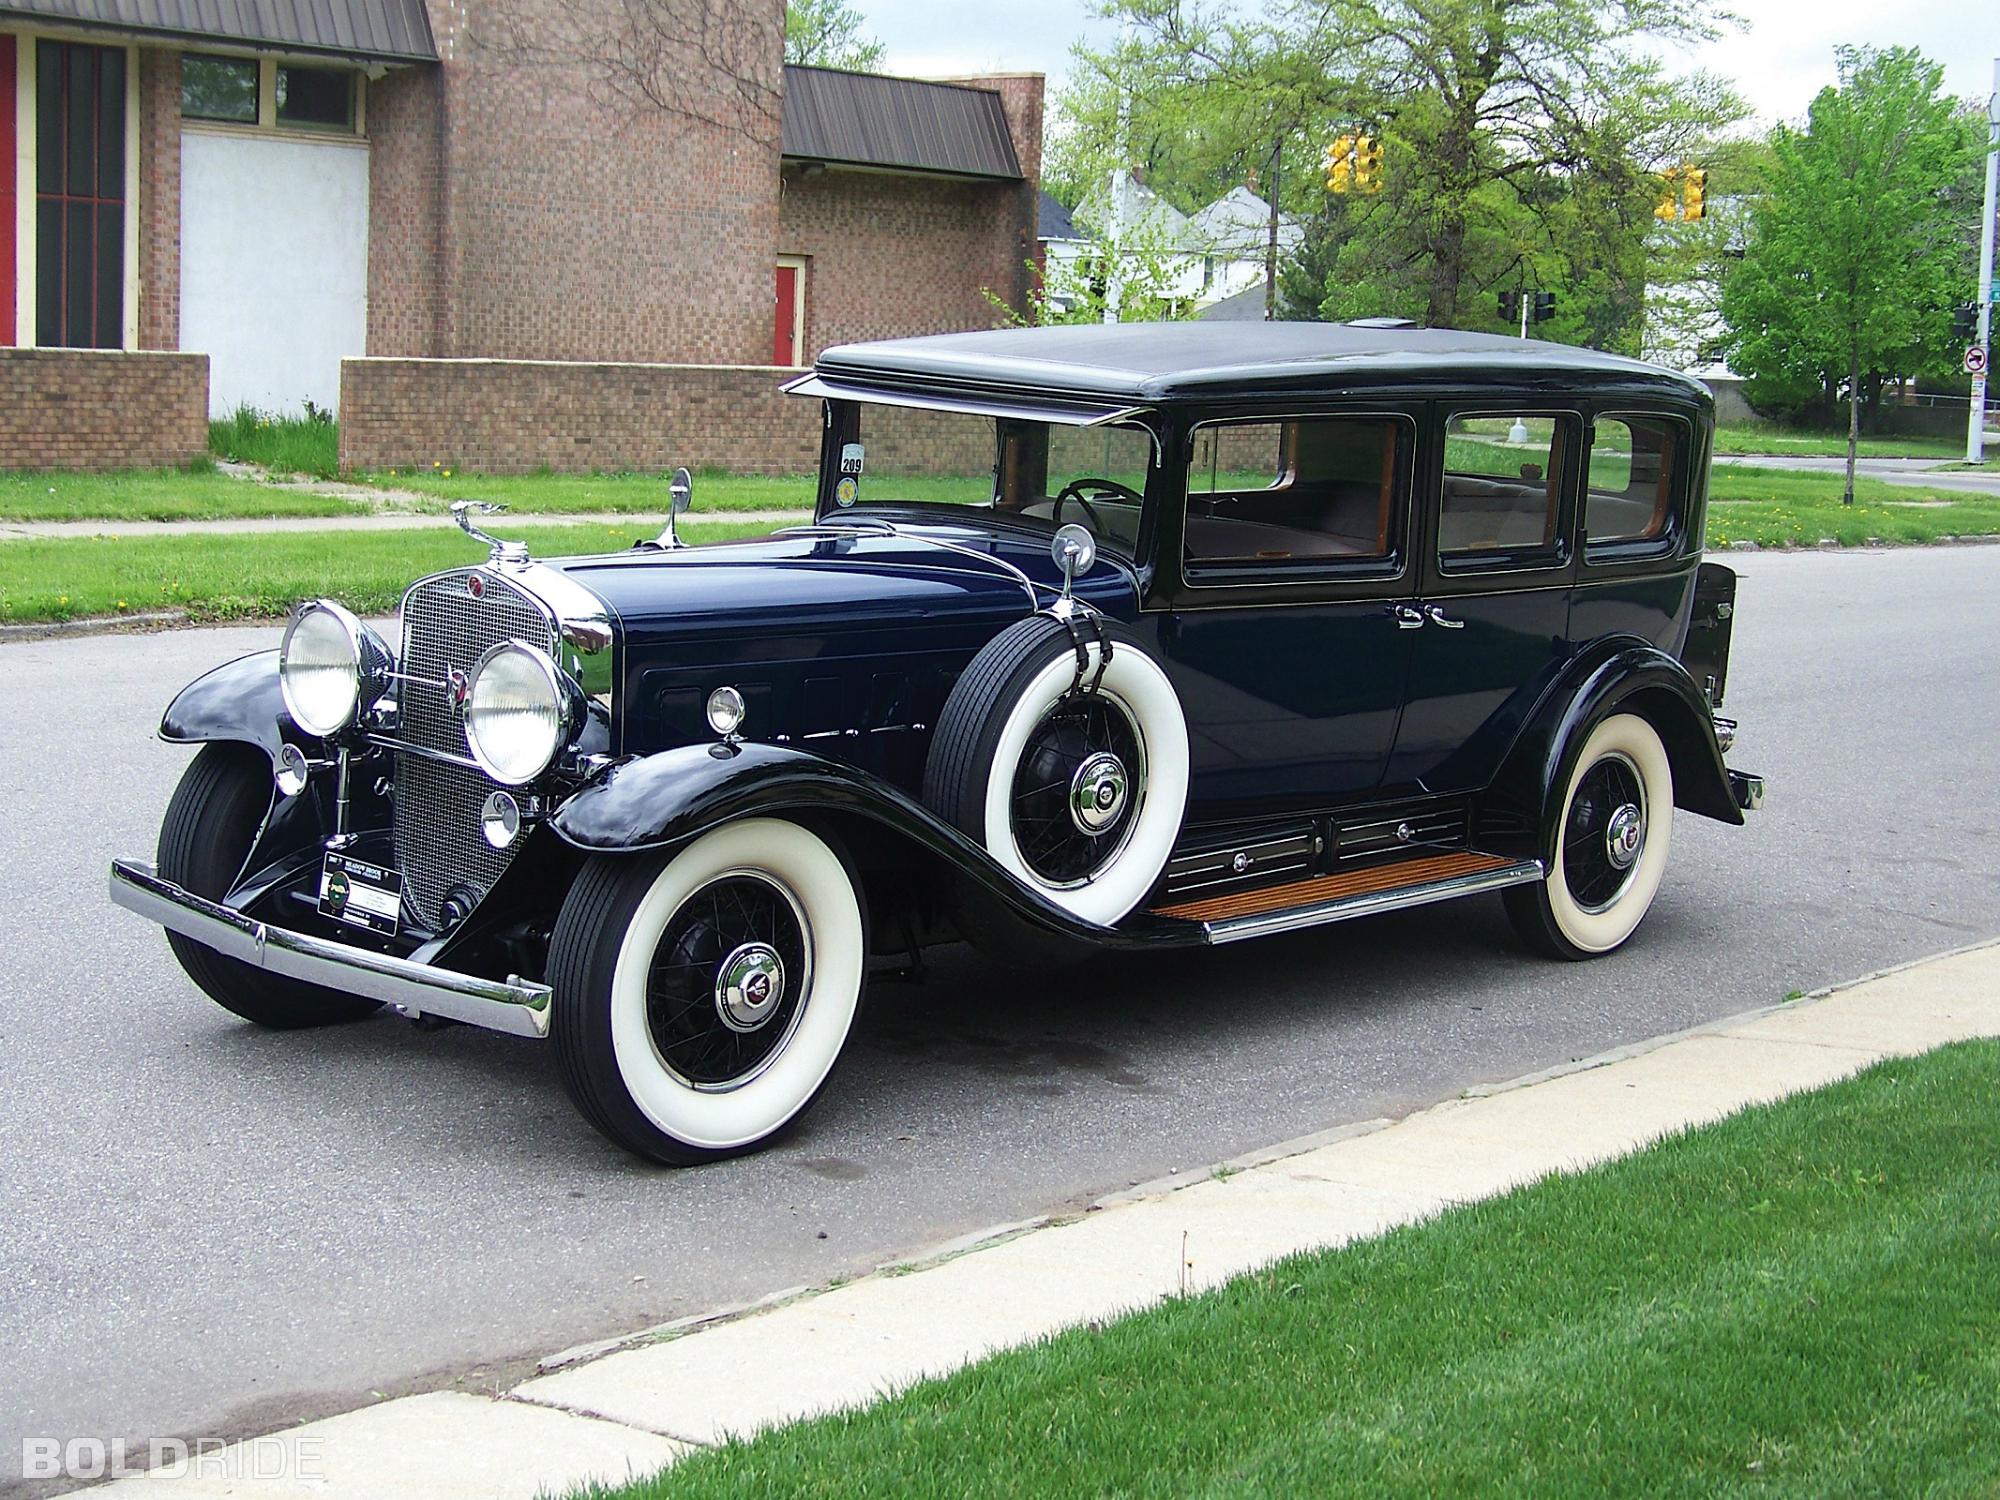 HQ 1930 Cadillac V16 Imperial Sedan Wallpapers | File 3434.69Kb